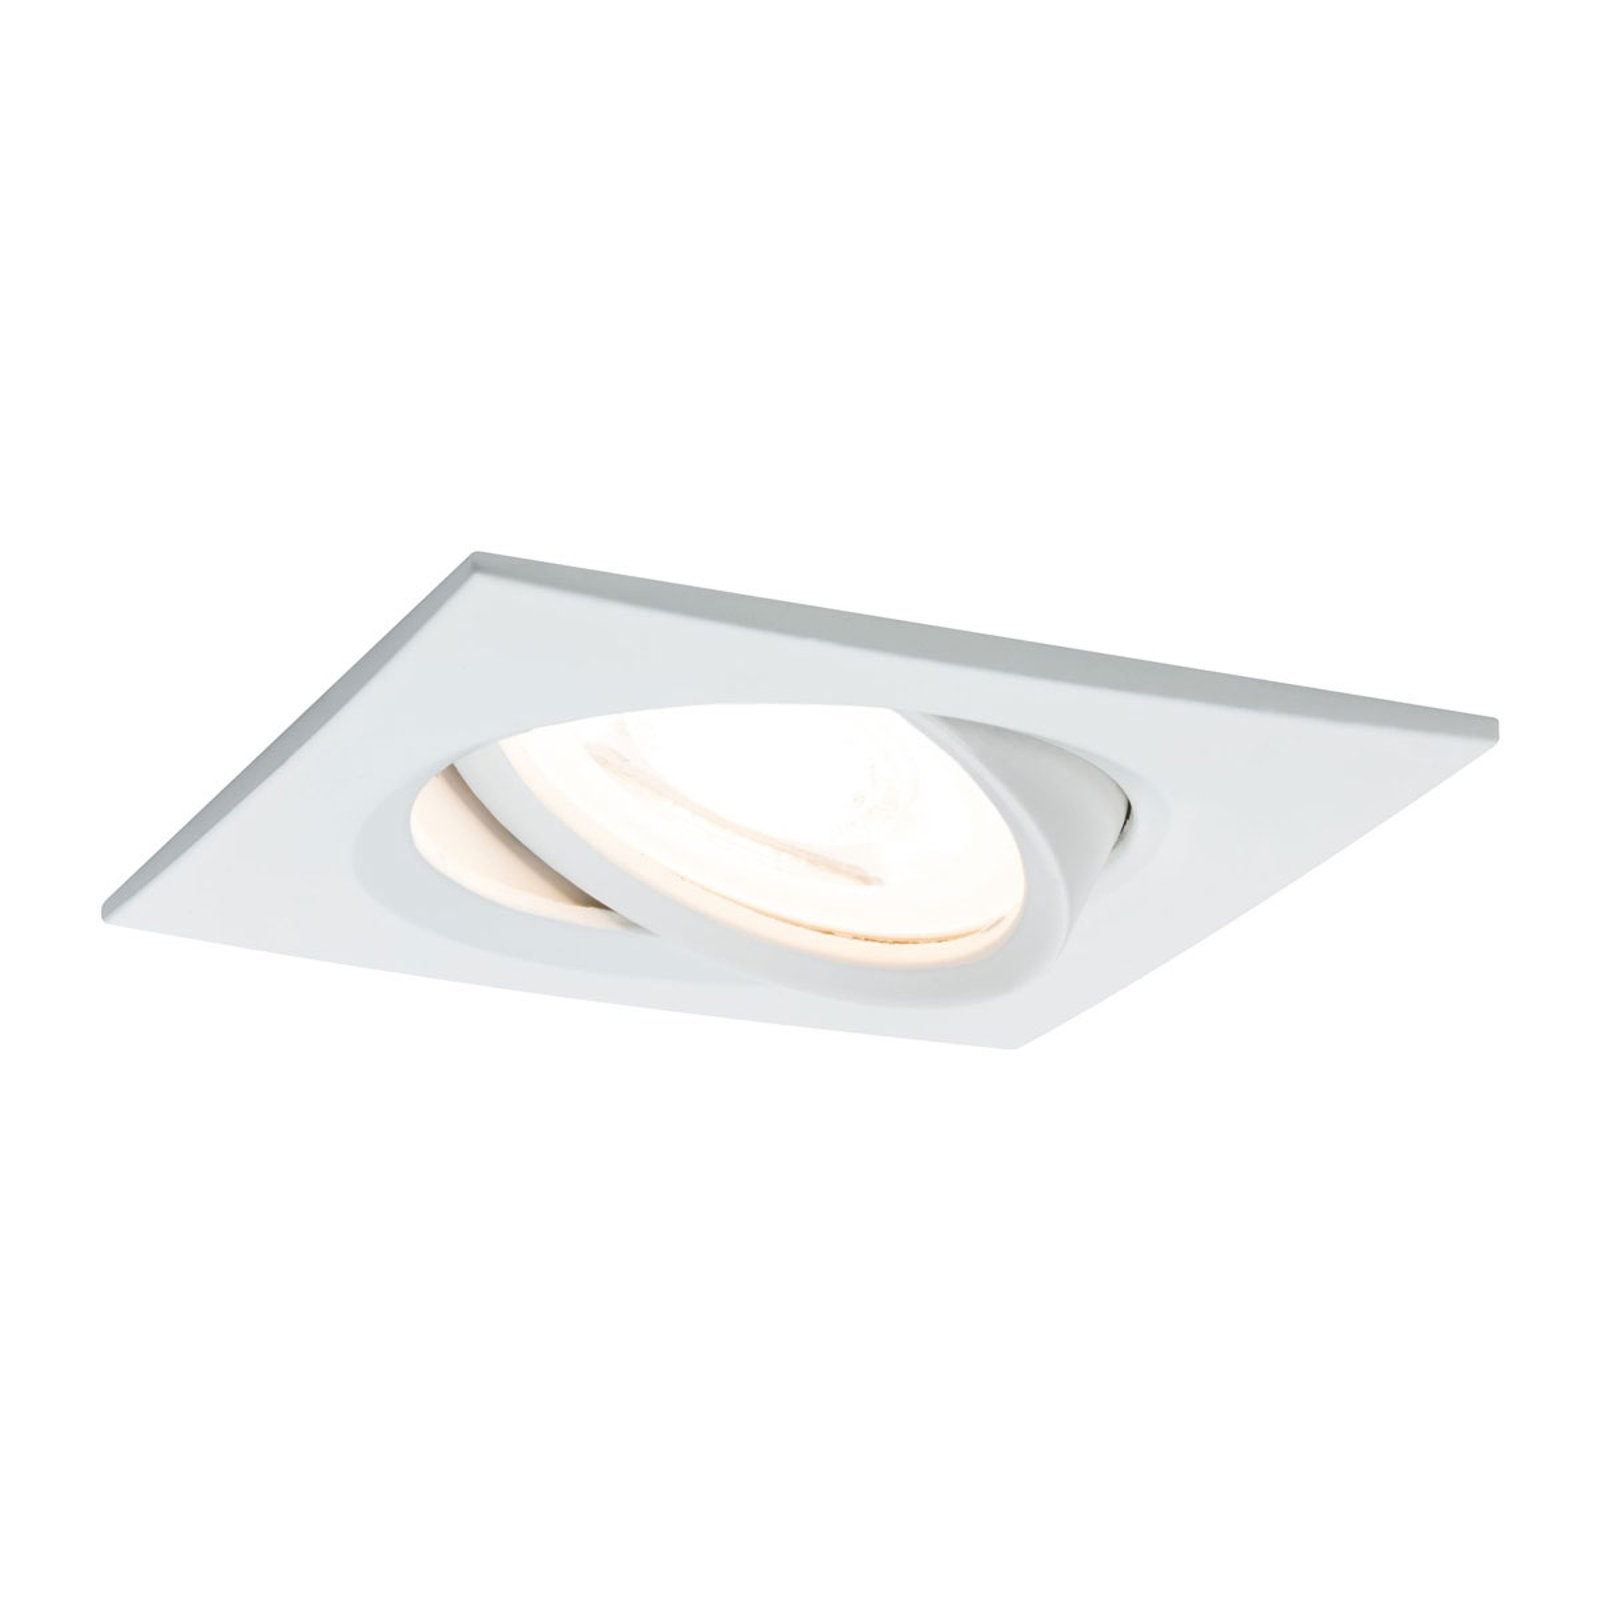 Paulmann LED-Spot Nova Coin eckig, dimmbar, weiß